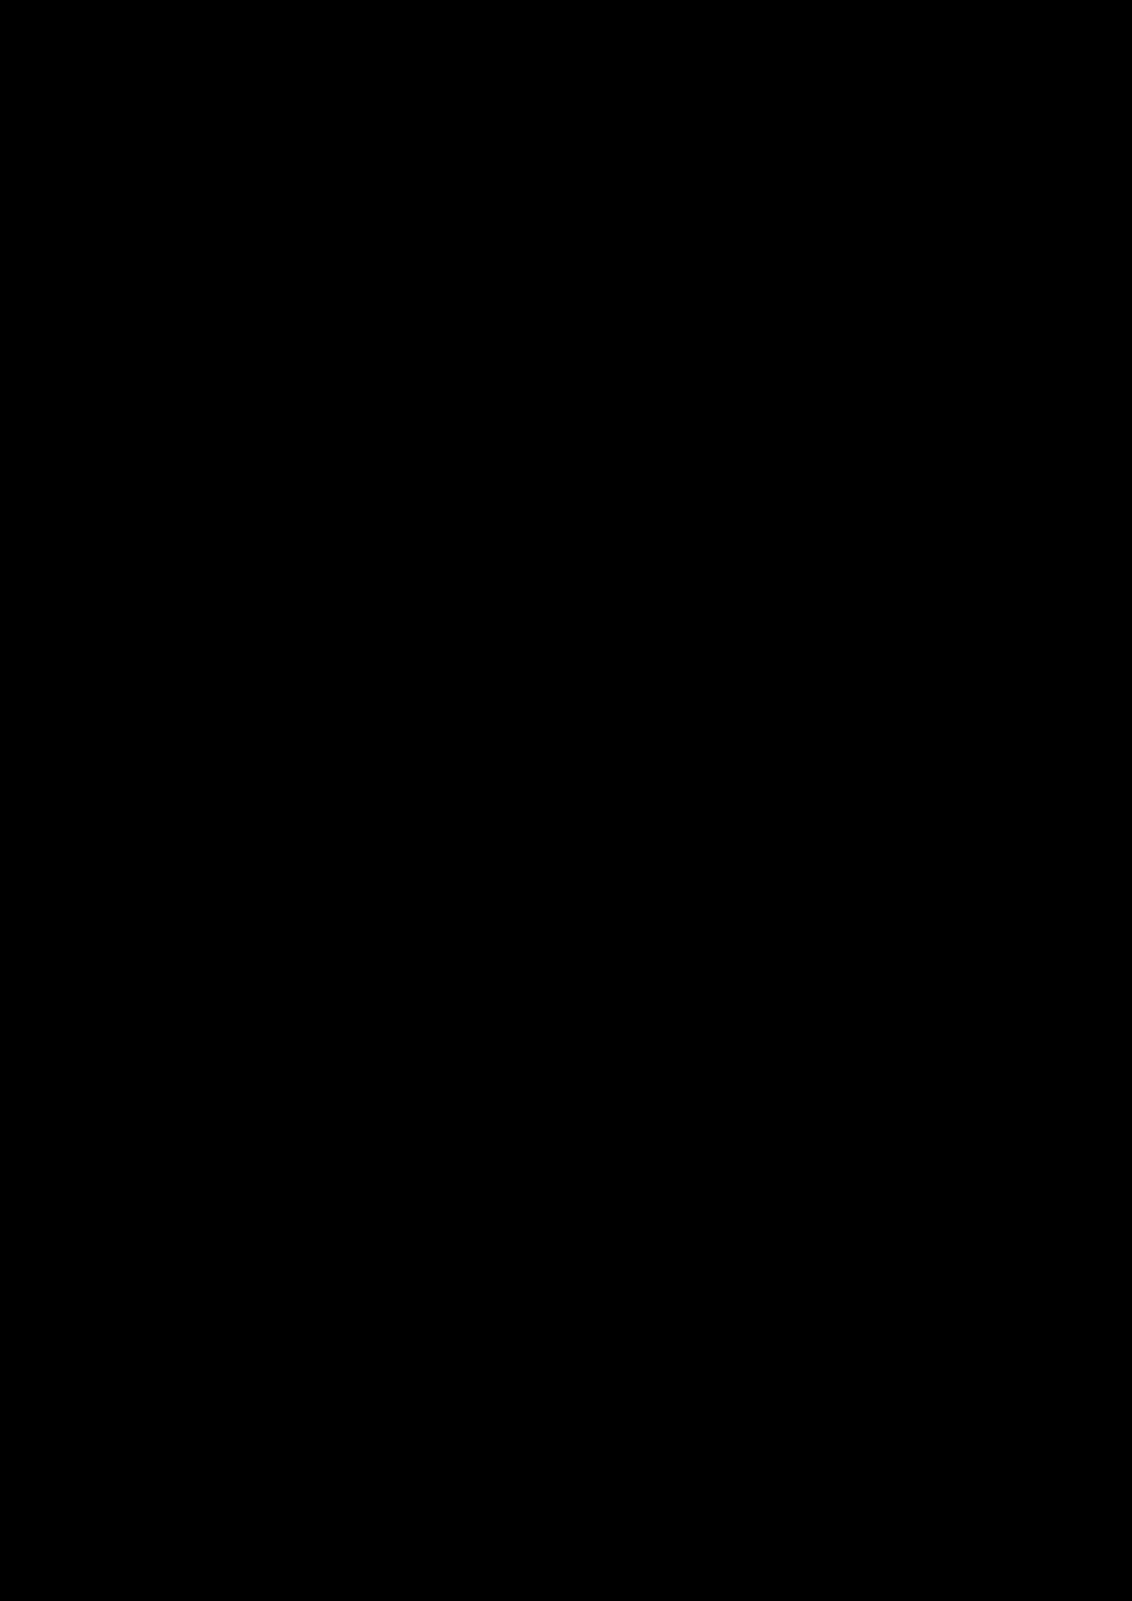 Ten lyubvi slide, Image 30